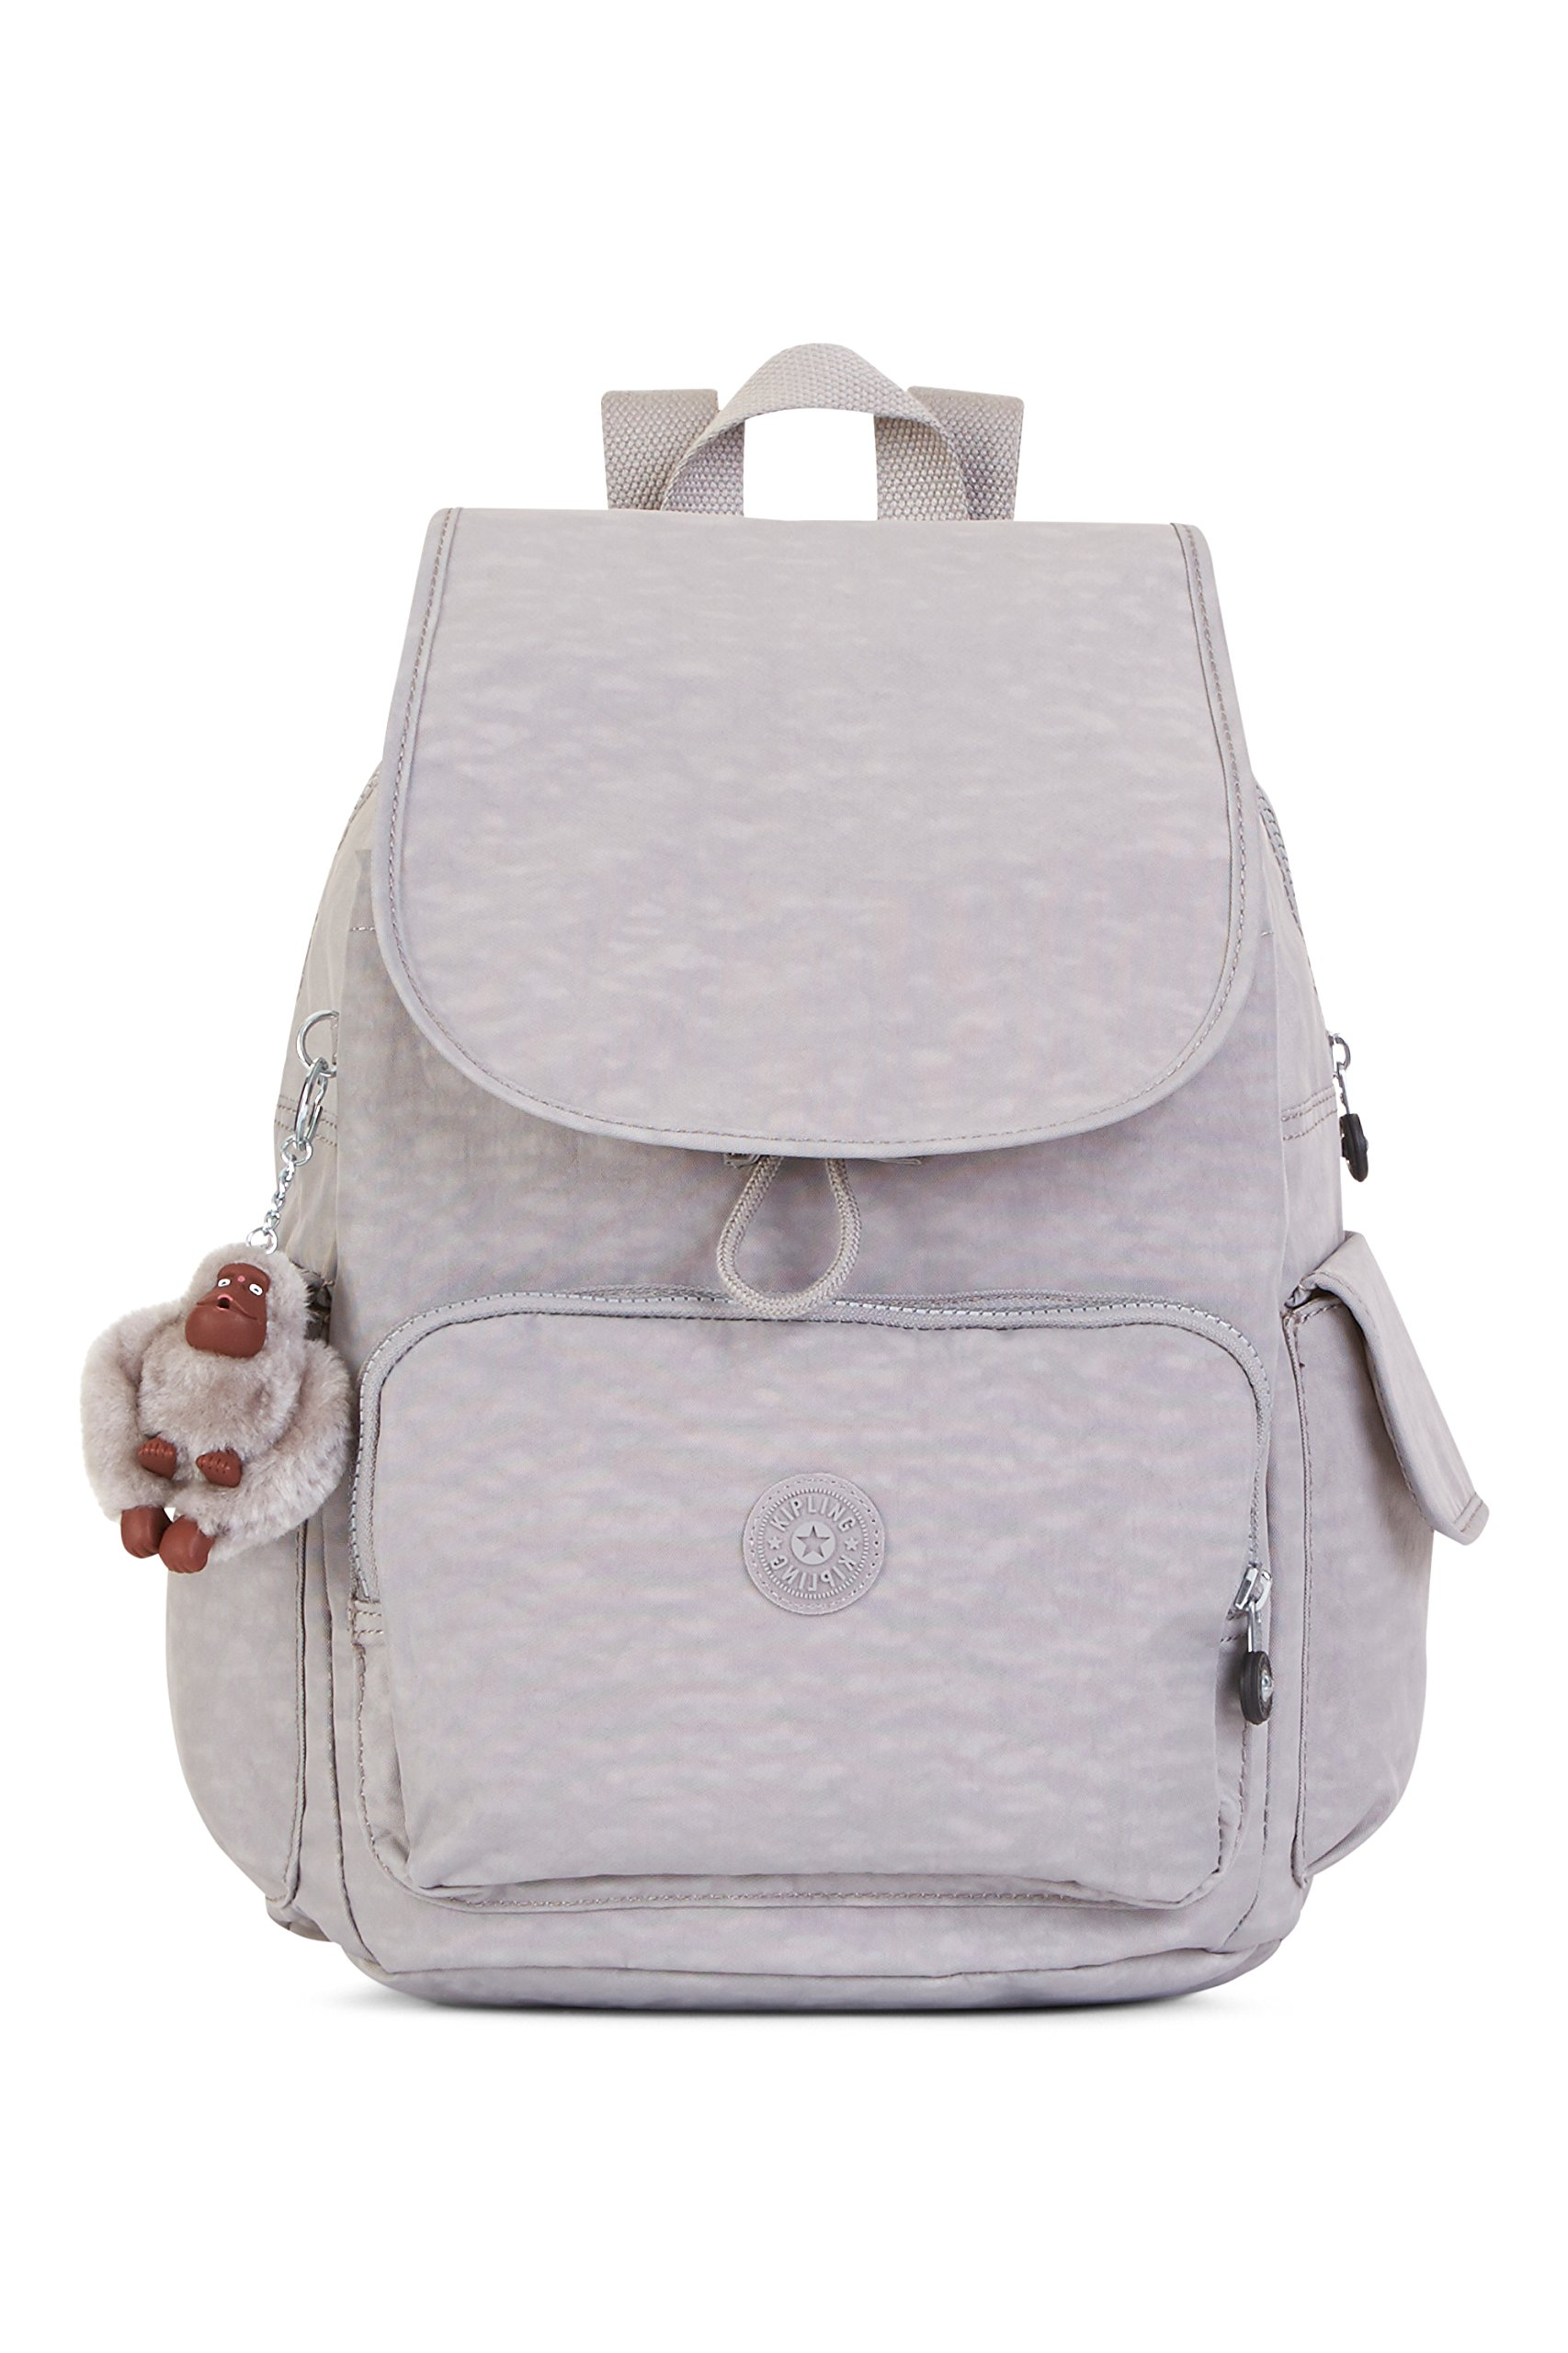 Kipling City Pack Multipurpose Backpack, Slate Grey, One Size